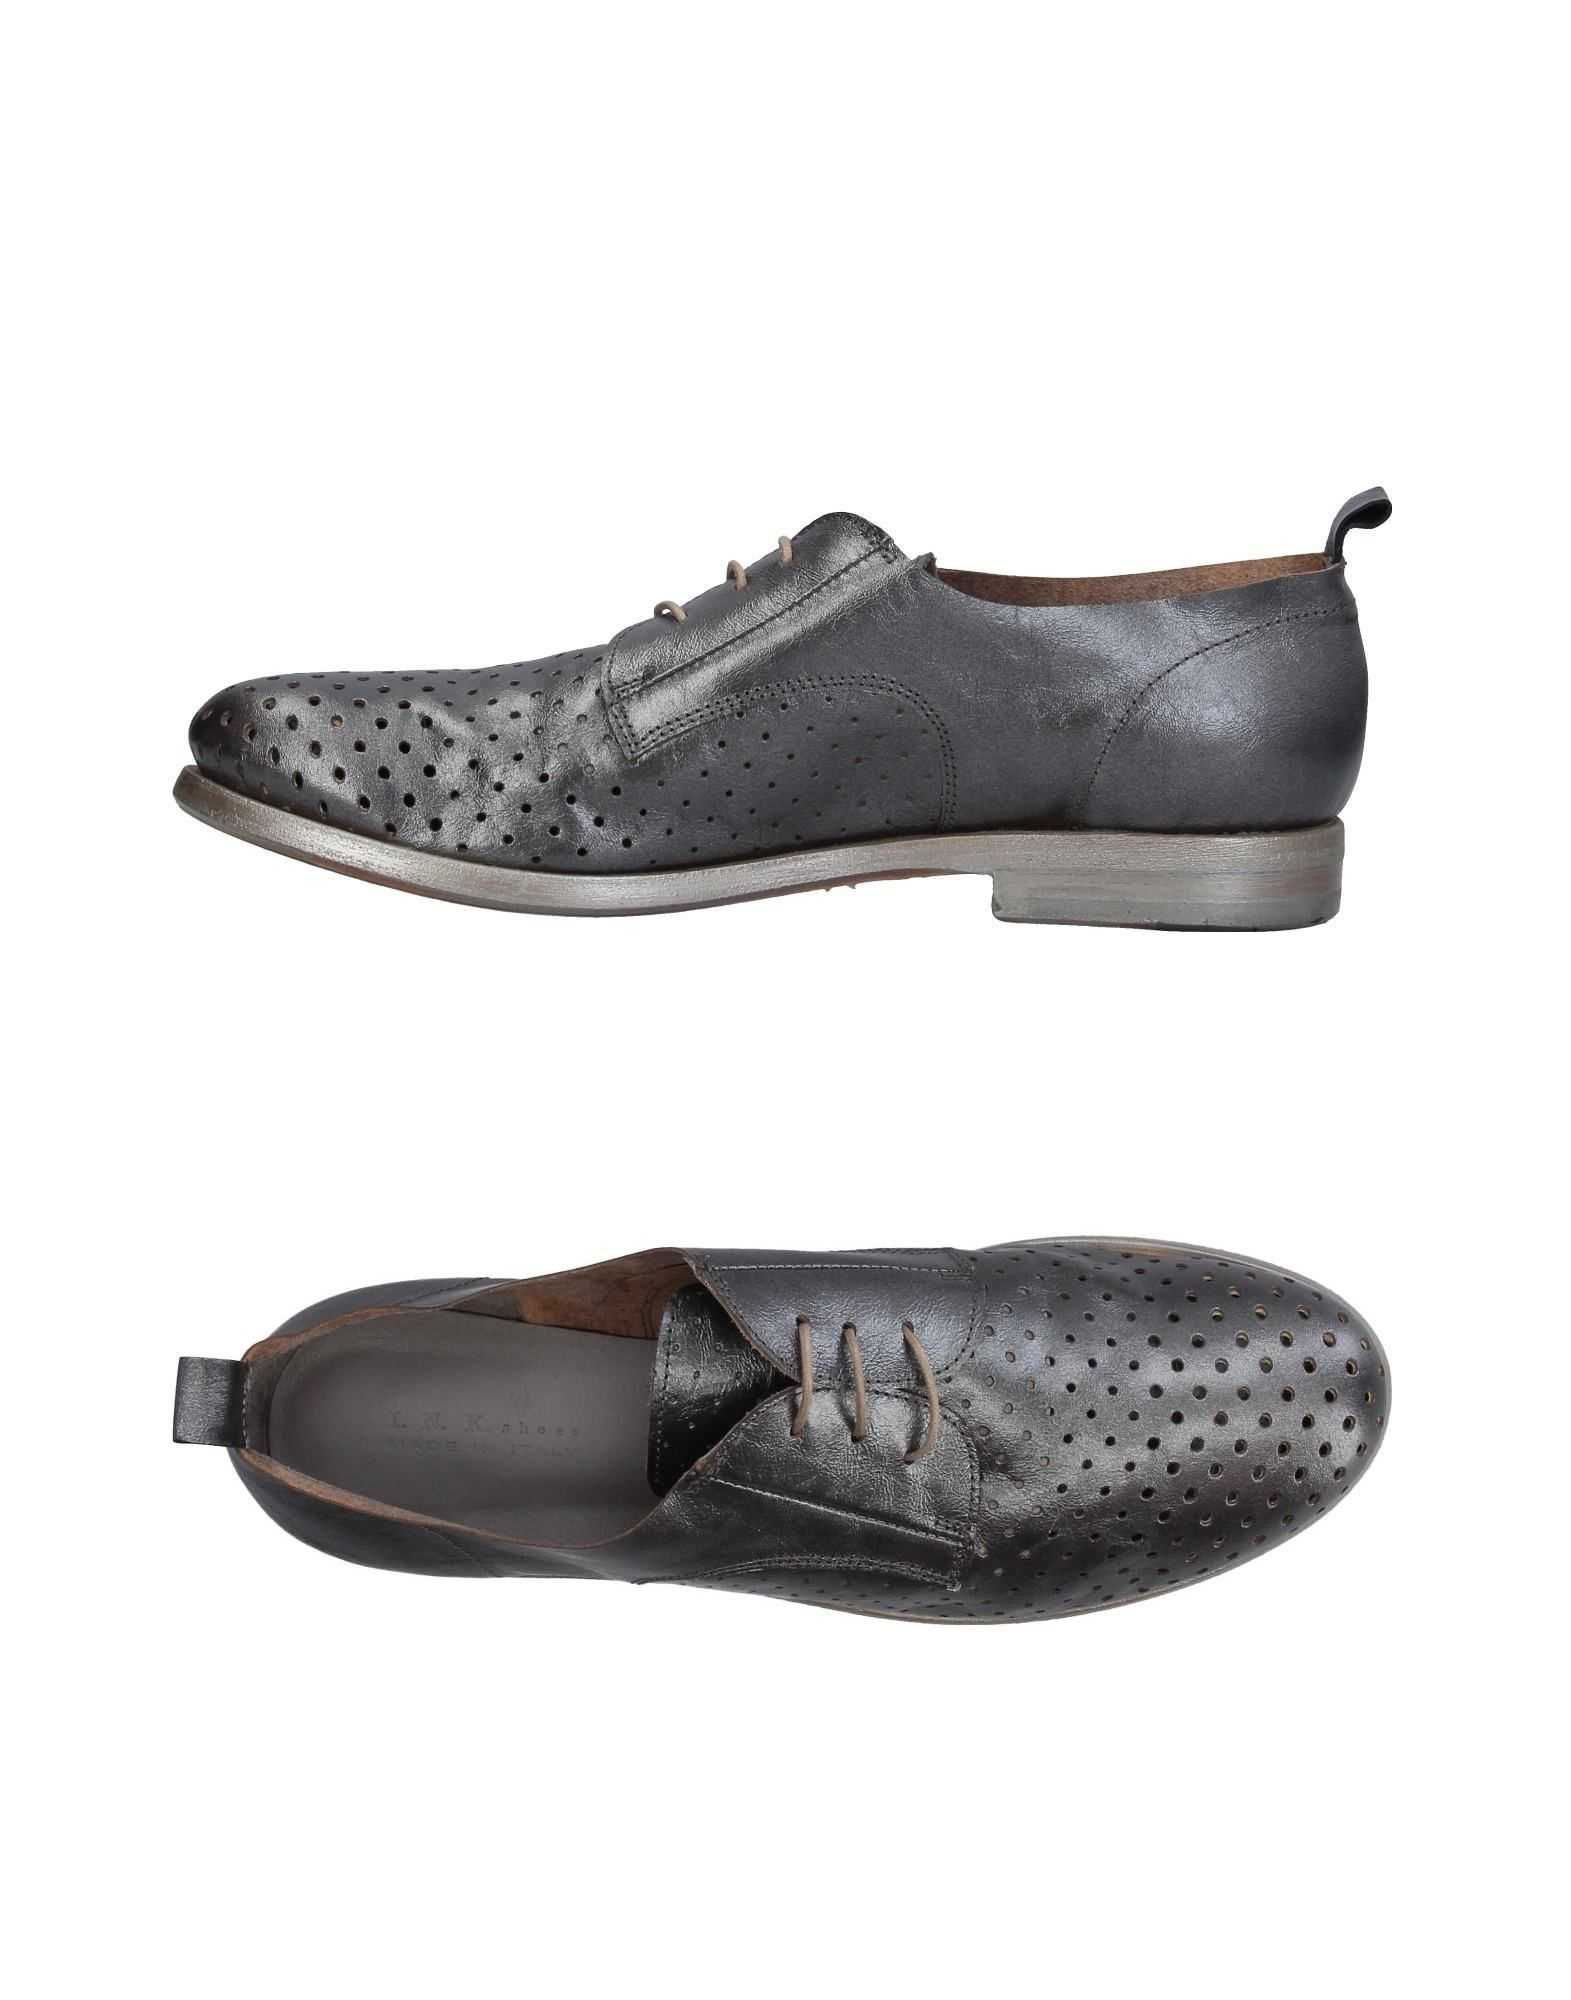 Stilvolle billige Schuhe I.N.K. Damen Schuhes Schnürschuhe Damen I.N.K. 11401496AS 6cebfa